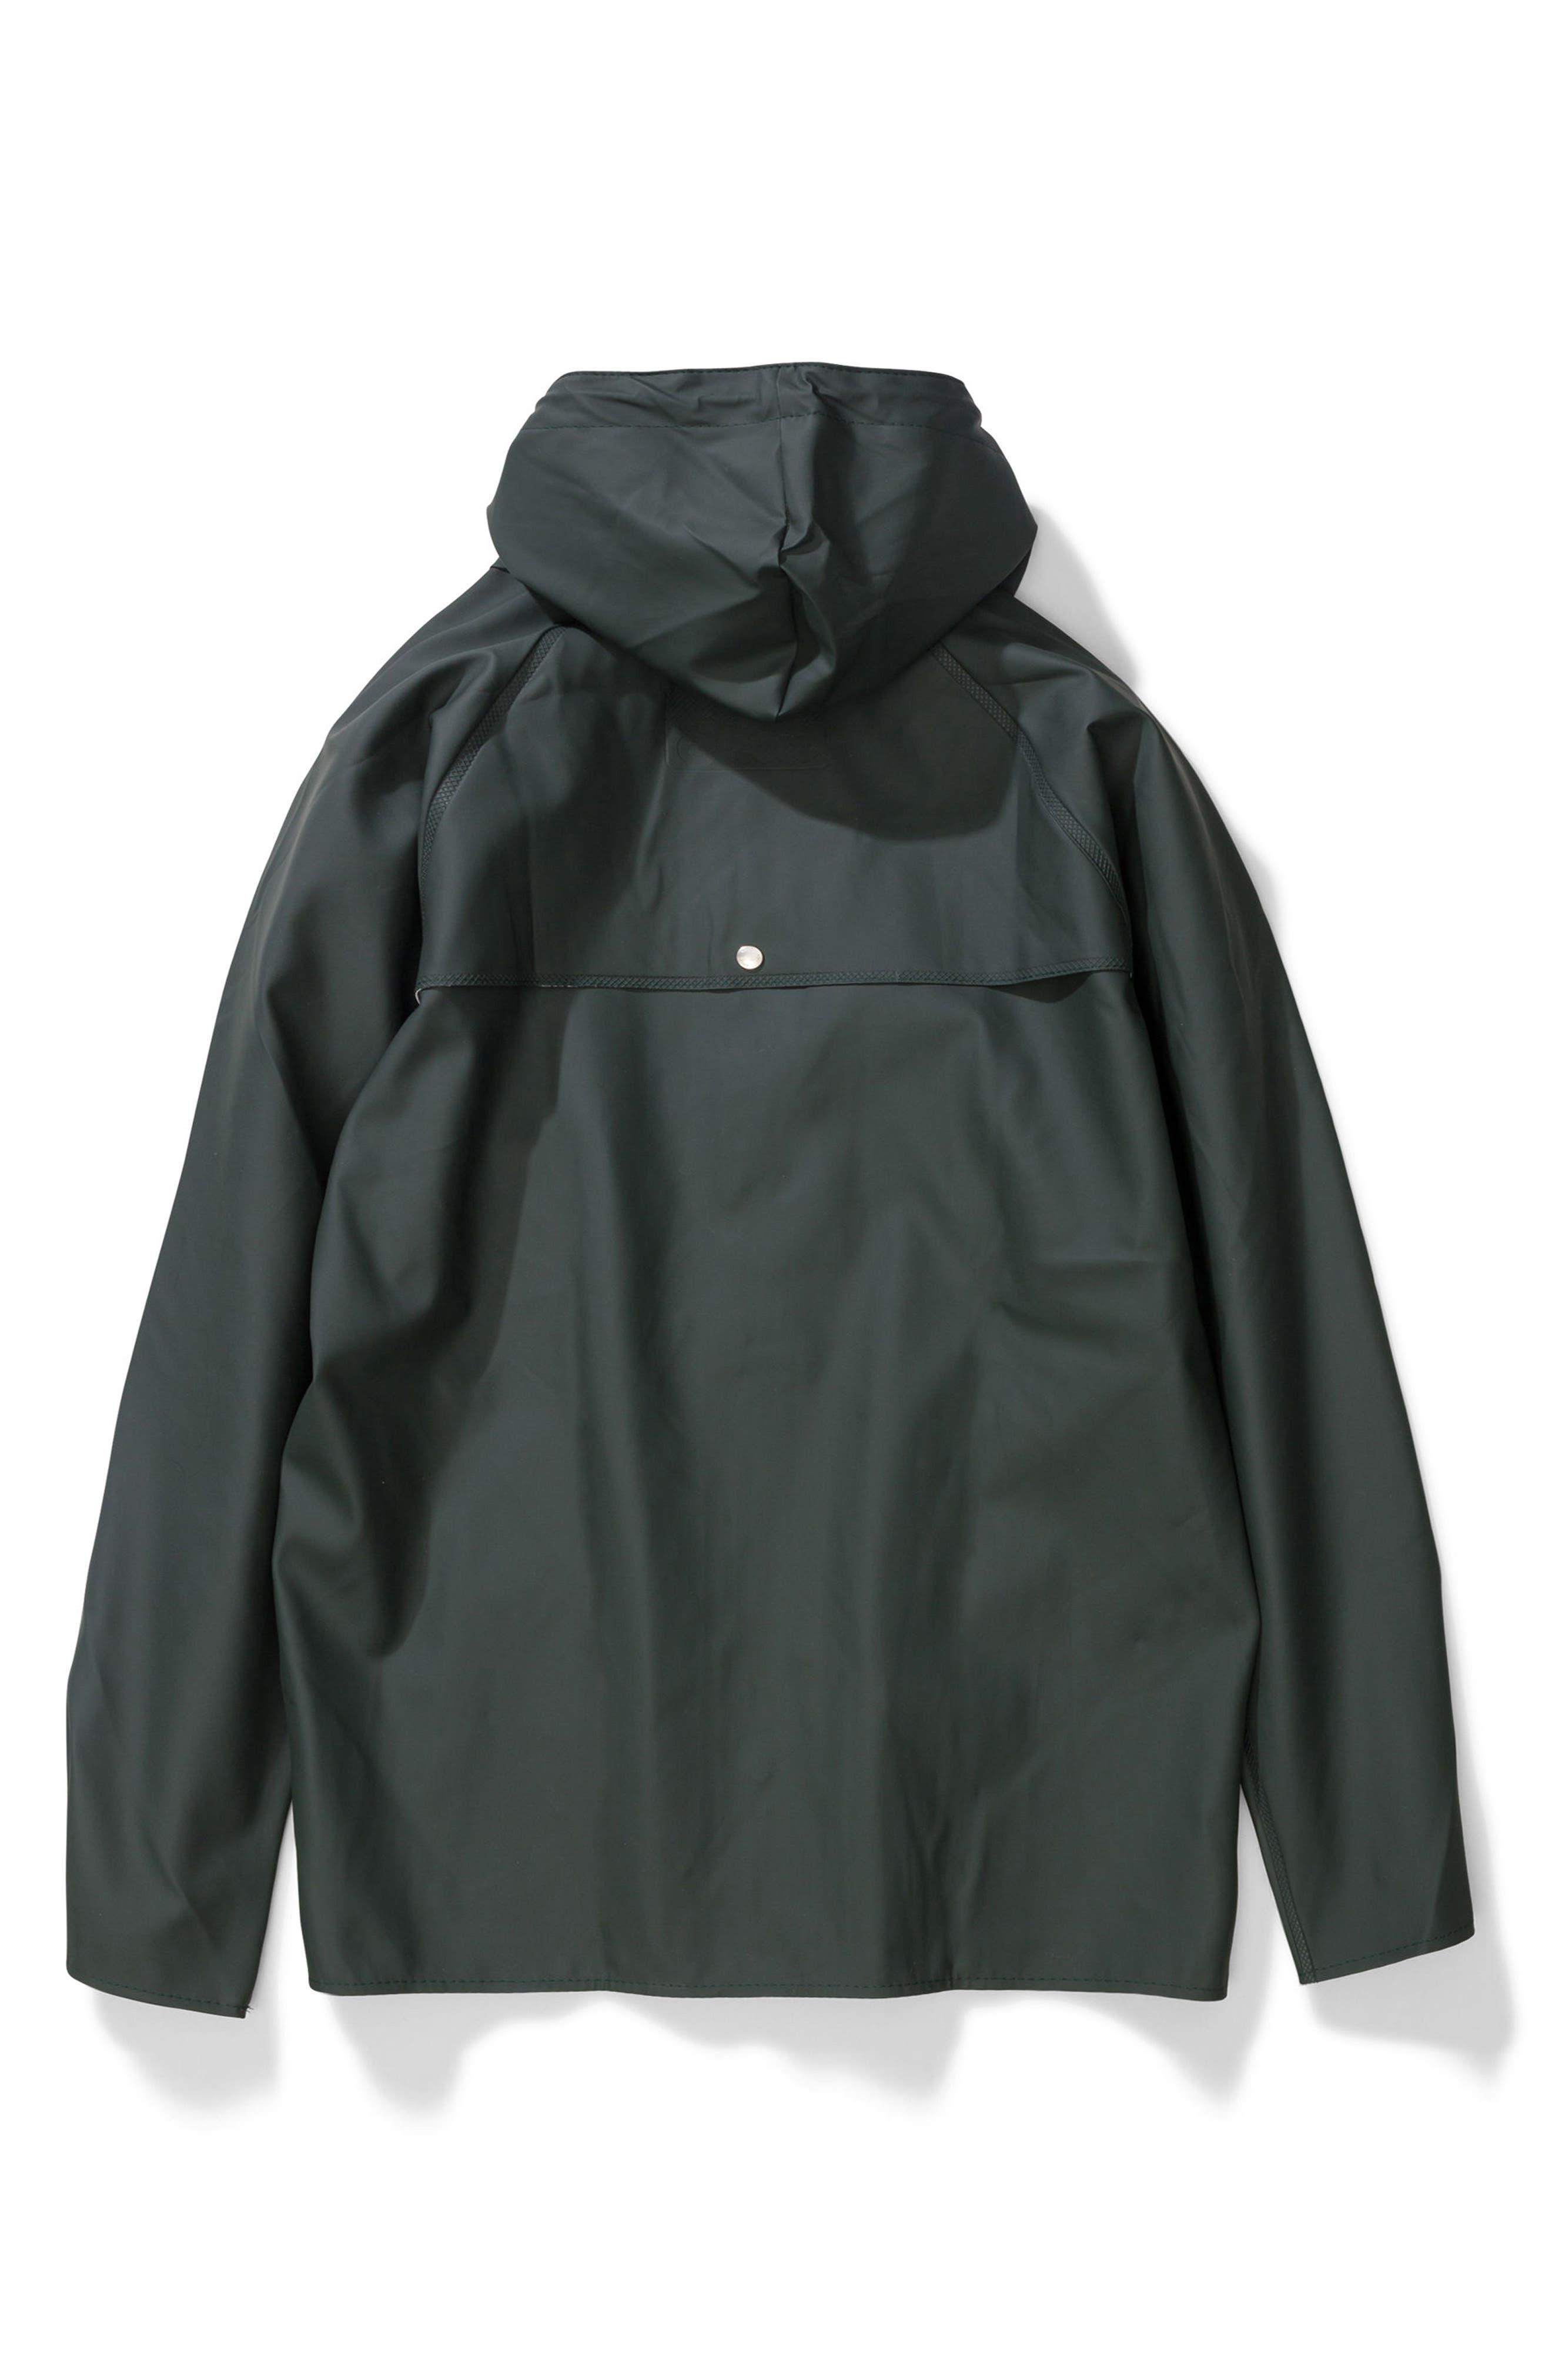 Waterproof Rain Jacket,                             Alternate thumbnail 13, color,                             Moss